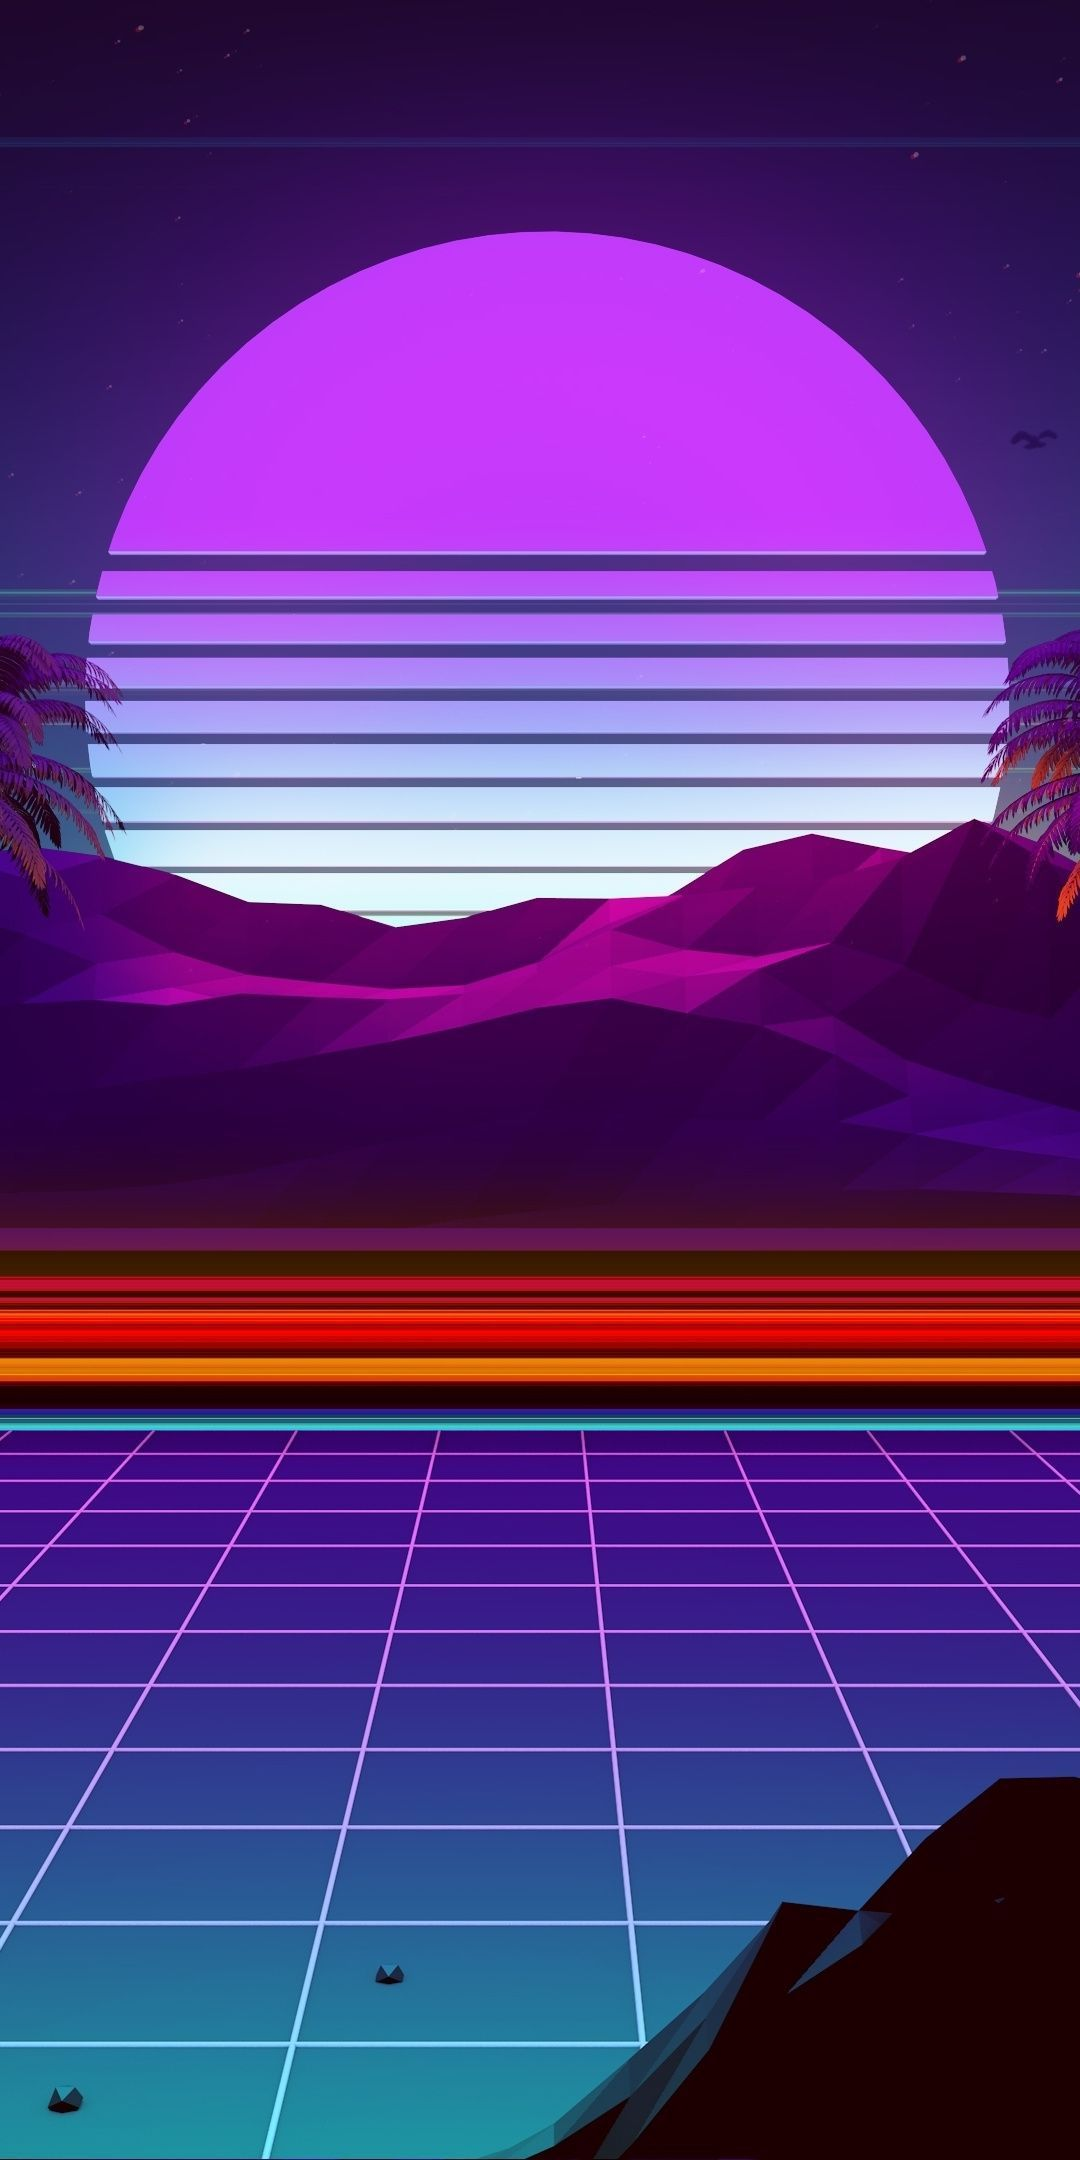 1080x2160 Night, moonlight, mountain, Synthwave and Retrowave, digital art wallpaper #ios13wallpaper 1080x2160 Night, moonlight, mountain, Synthwave and Retrowave, digital art wallpaper #ios13wallpaper 1080x2160 Night, moonlight, mountain, Synthwave and Retrowave, digital art wallpaper #ios13wallpaper 1080x2160 Night, moonlight, mountain, Synthwave and Retrowave, digital art wallpaper #ios13wallpaper